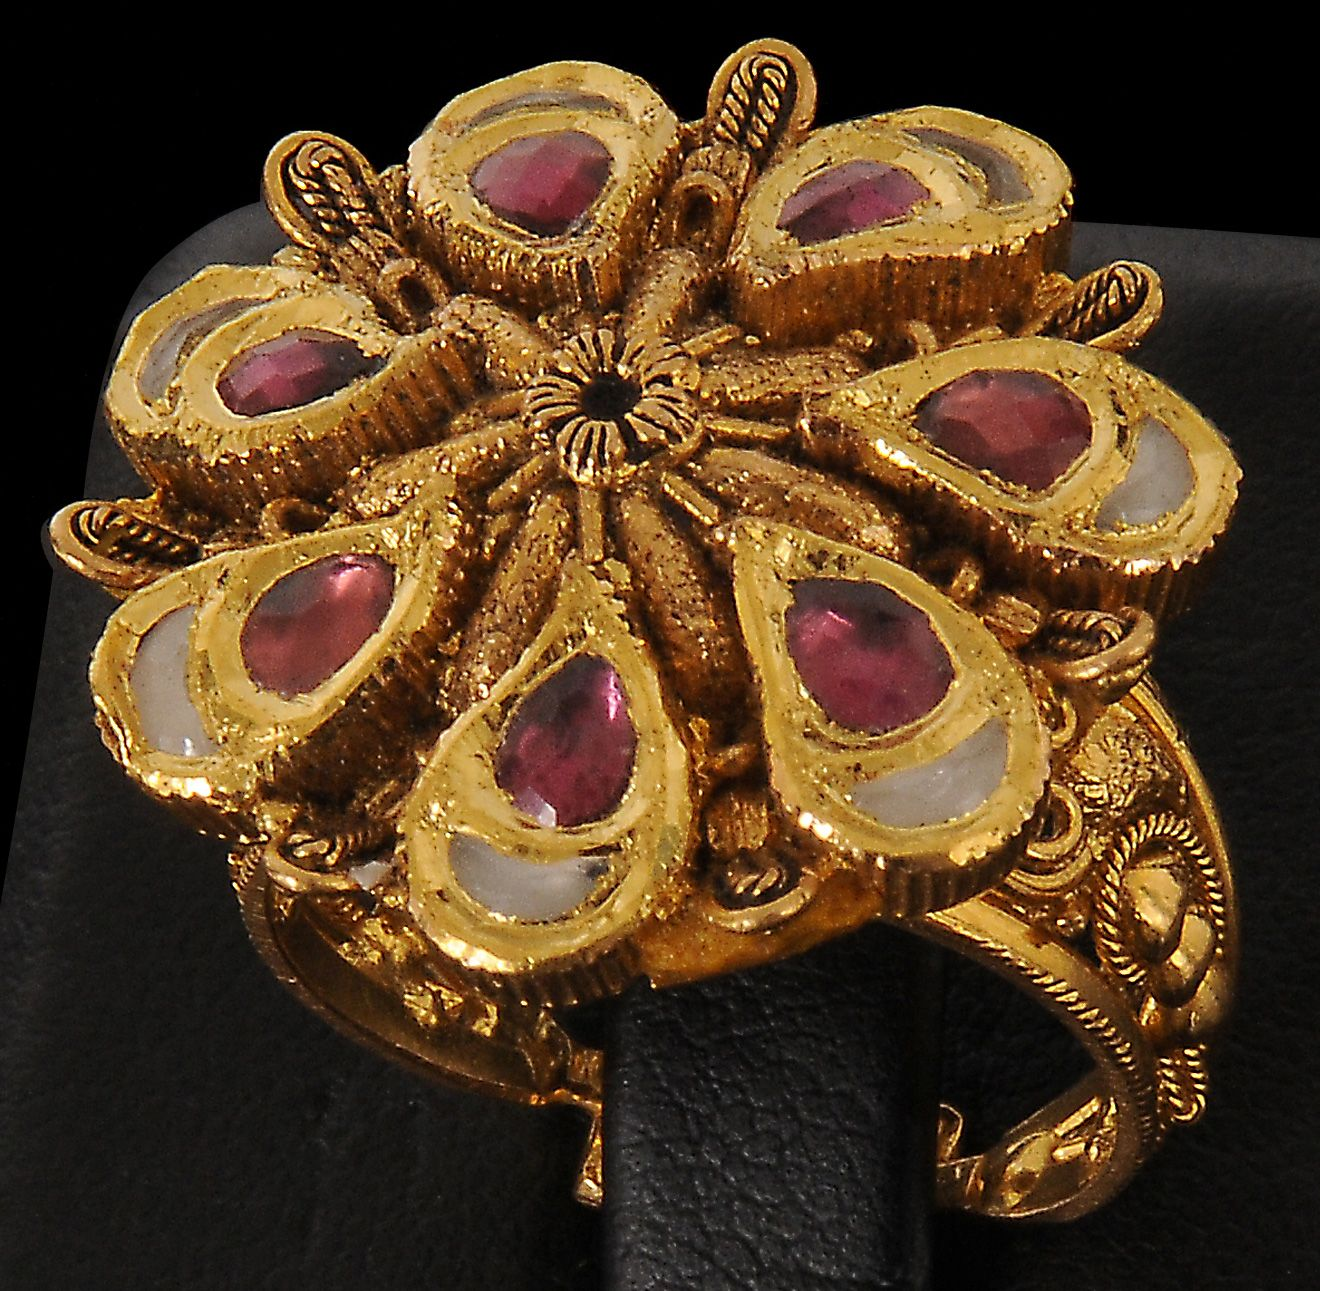 antique-gold-jewellery-designs-343 | Jewelery / Juwelen / Takı 2 ...